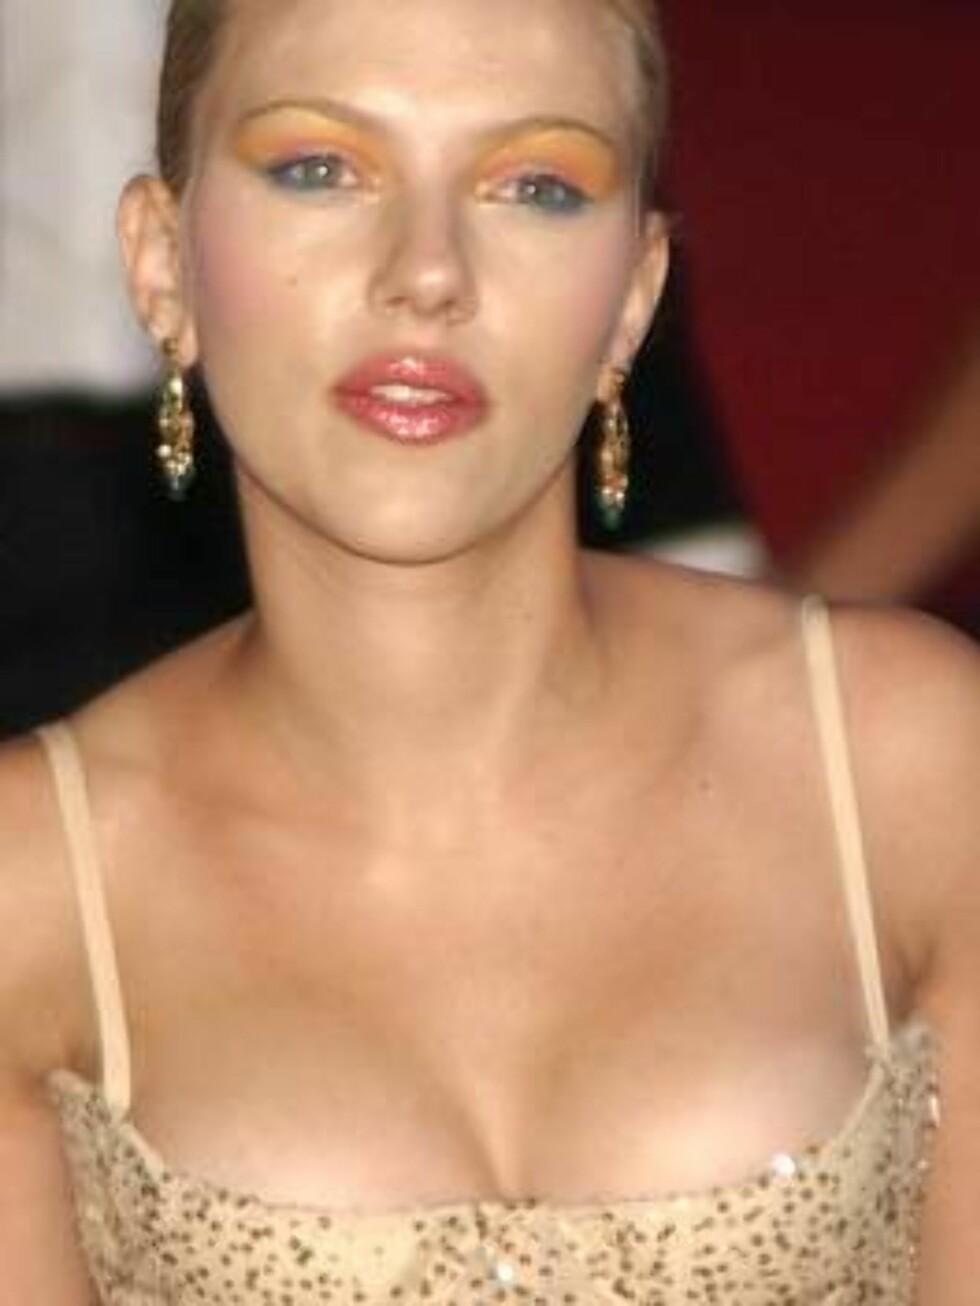 U.S. actress Scarlett Johansson arrives at the Brit music awards in London, Tuesday Feb. 17, 2004.(AP Photo/Max Nash) Foto: AP/Scanpix